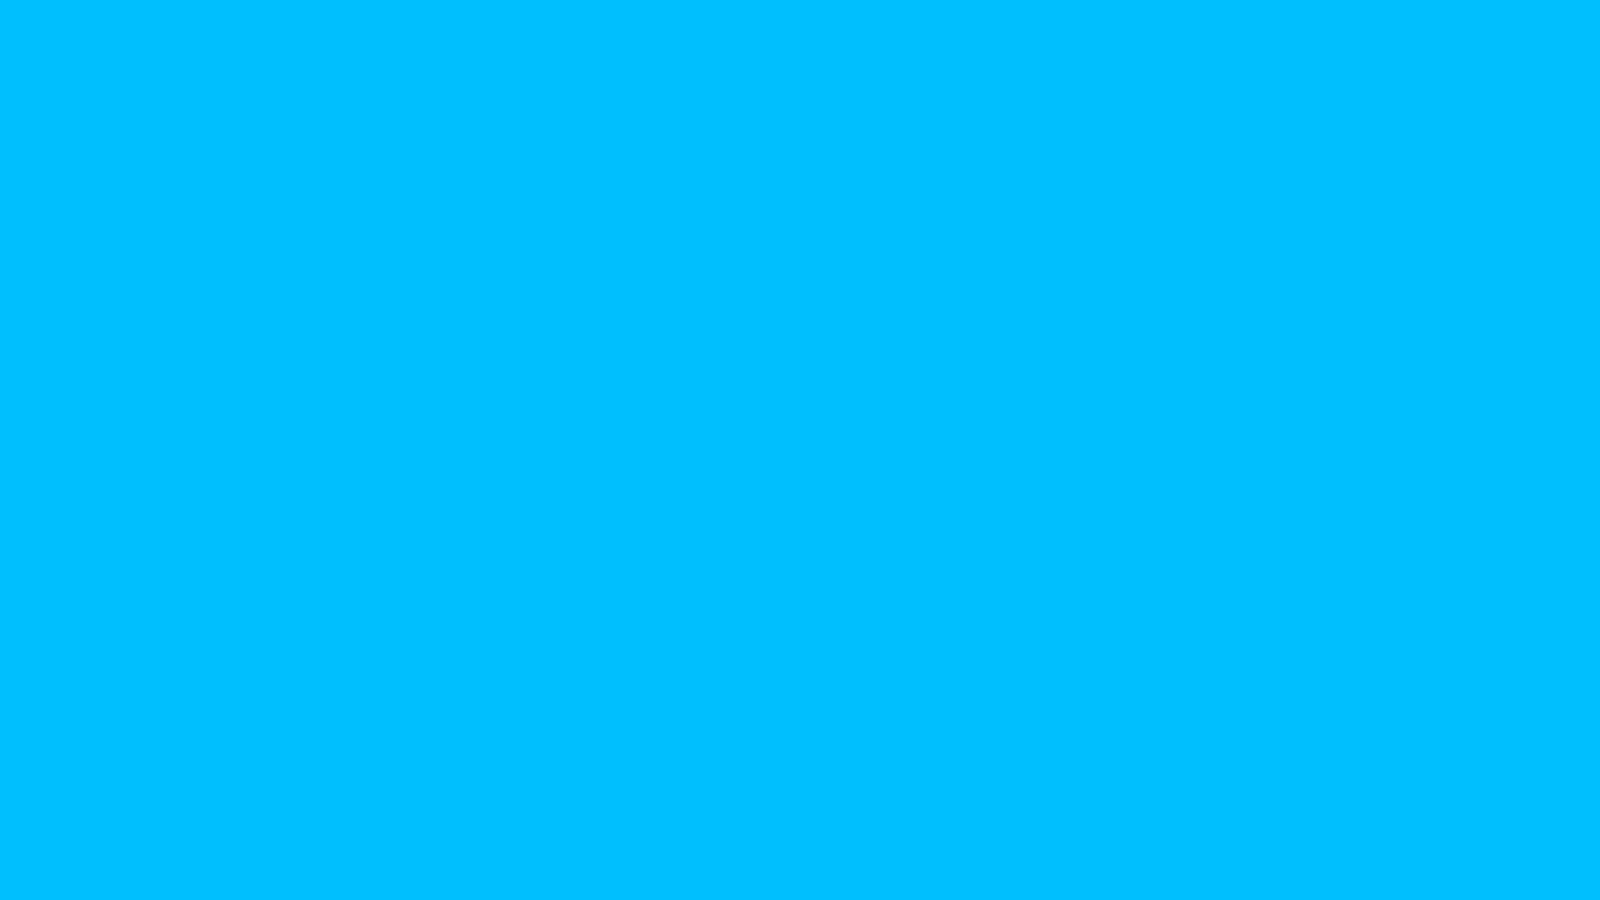 1600x900 Capri Solid Color Background